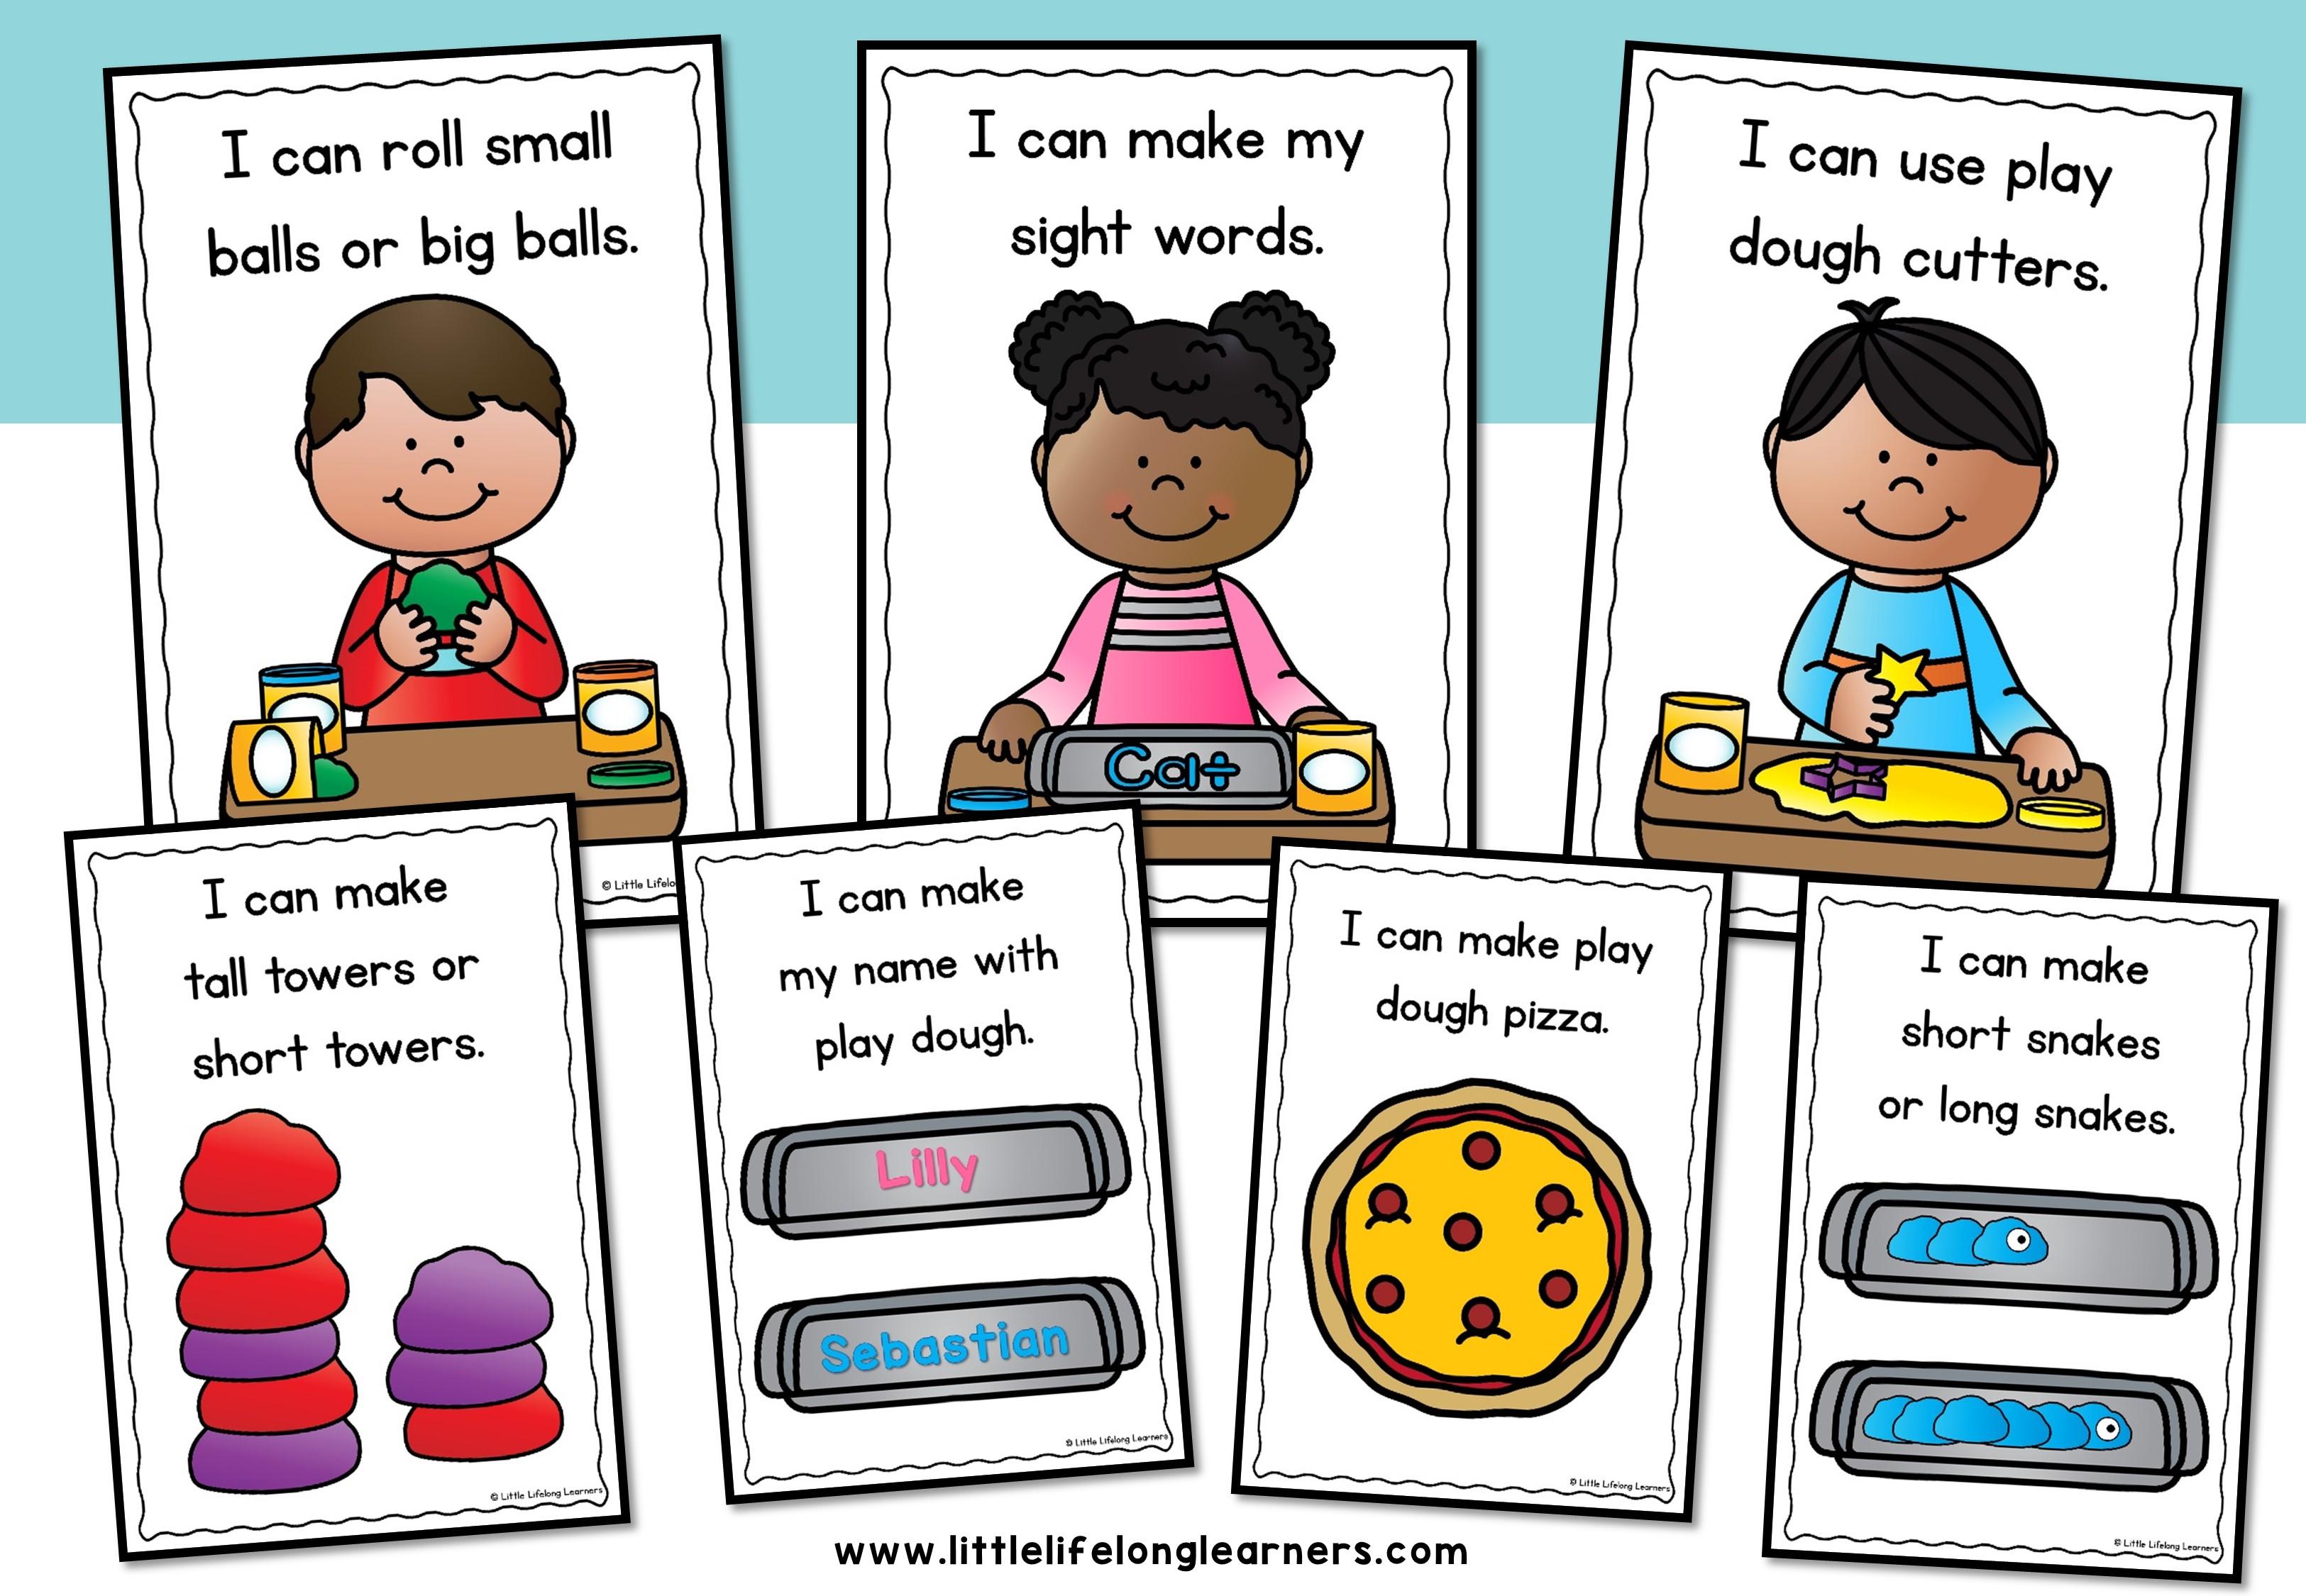 Playdough clipart small group. Play dough task cards